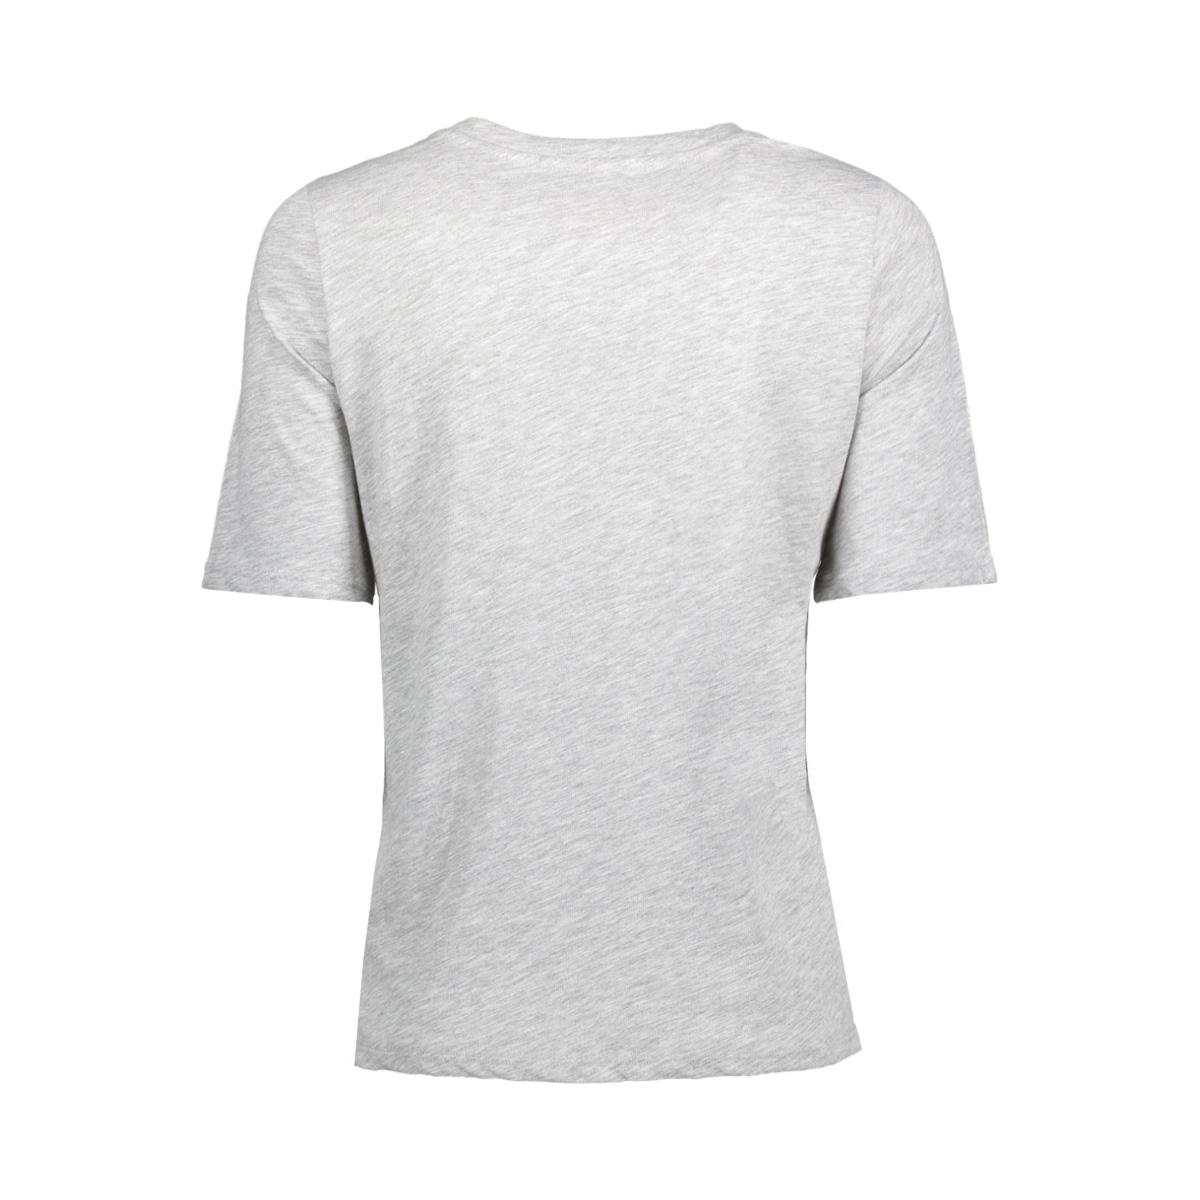 onlcoca cola tee jrs 15151703 only t-shirt light grey mela/racing red